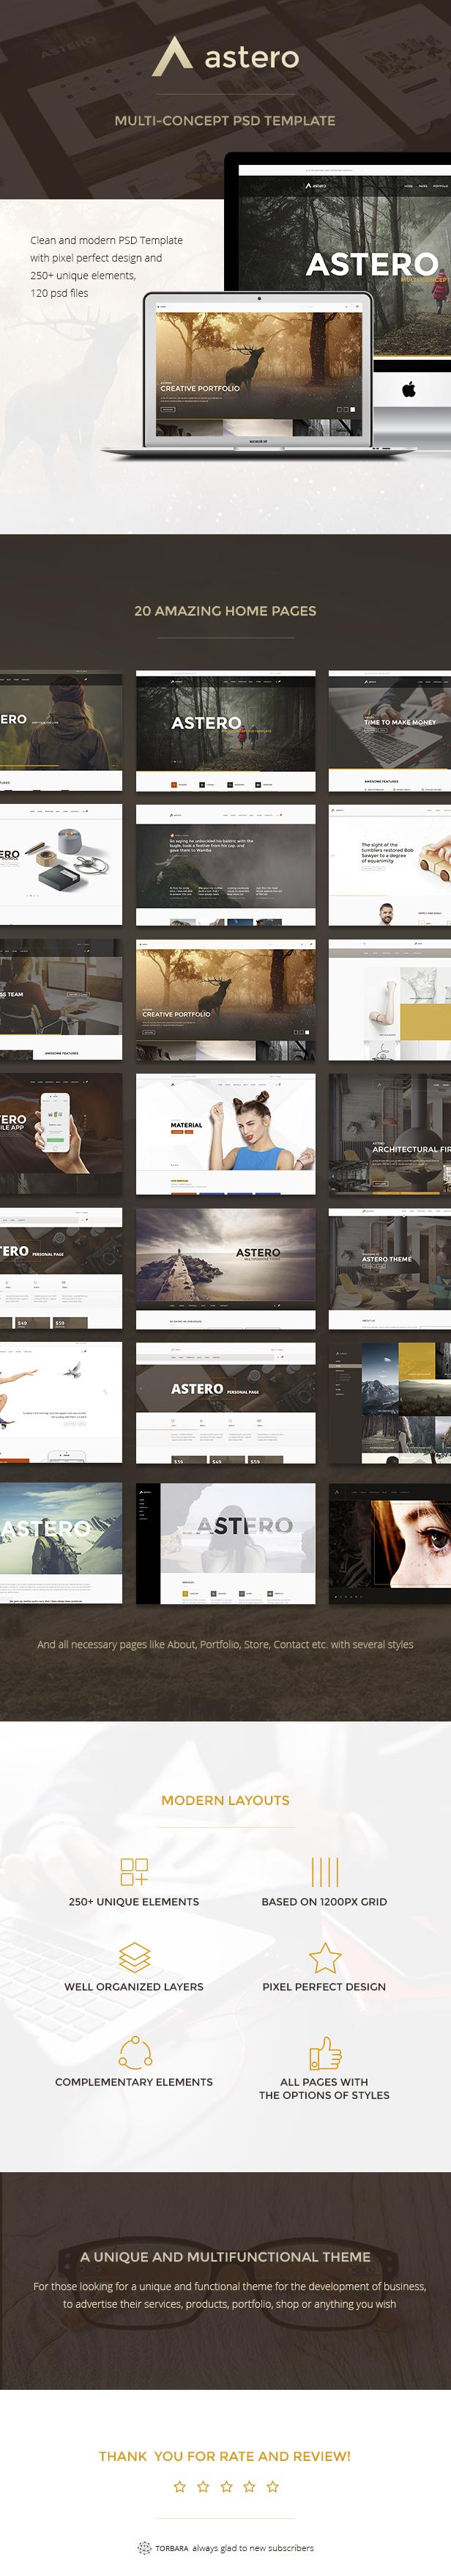 Astero — Multipurpose Portfolio | Blog | Store PSD Template - 1